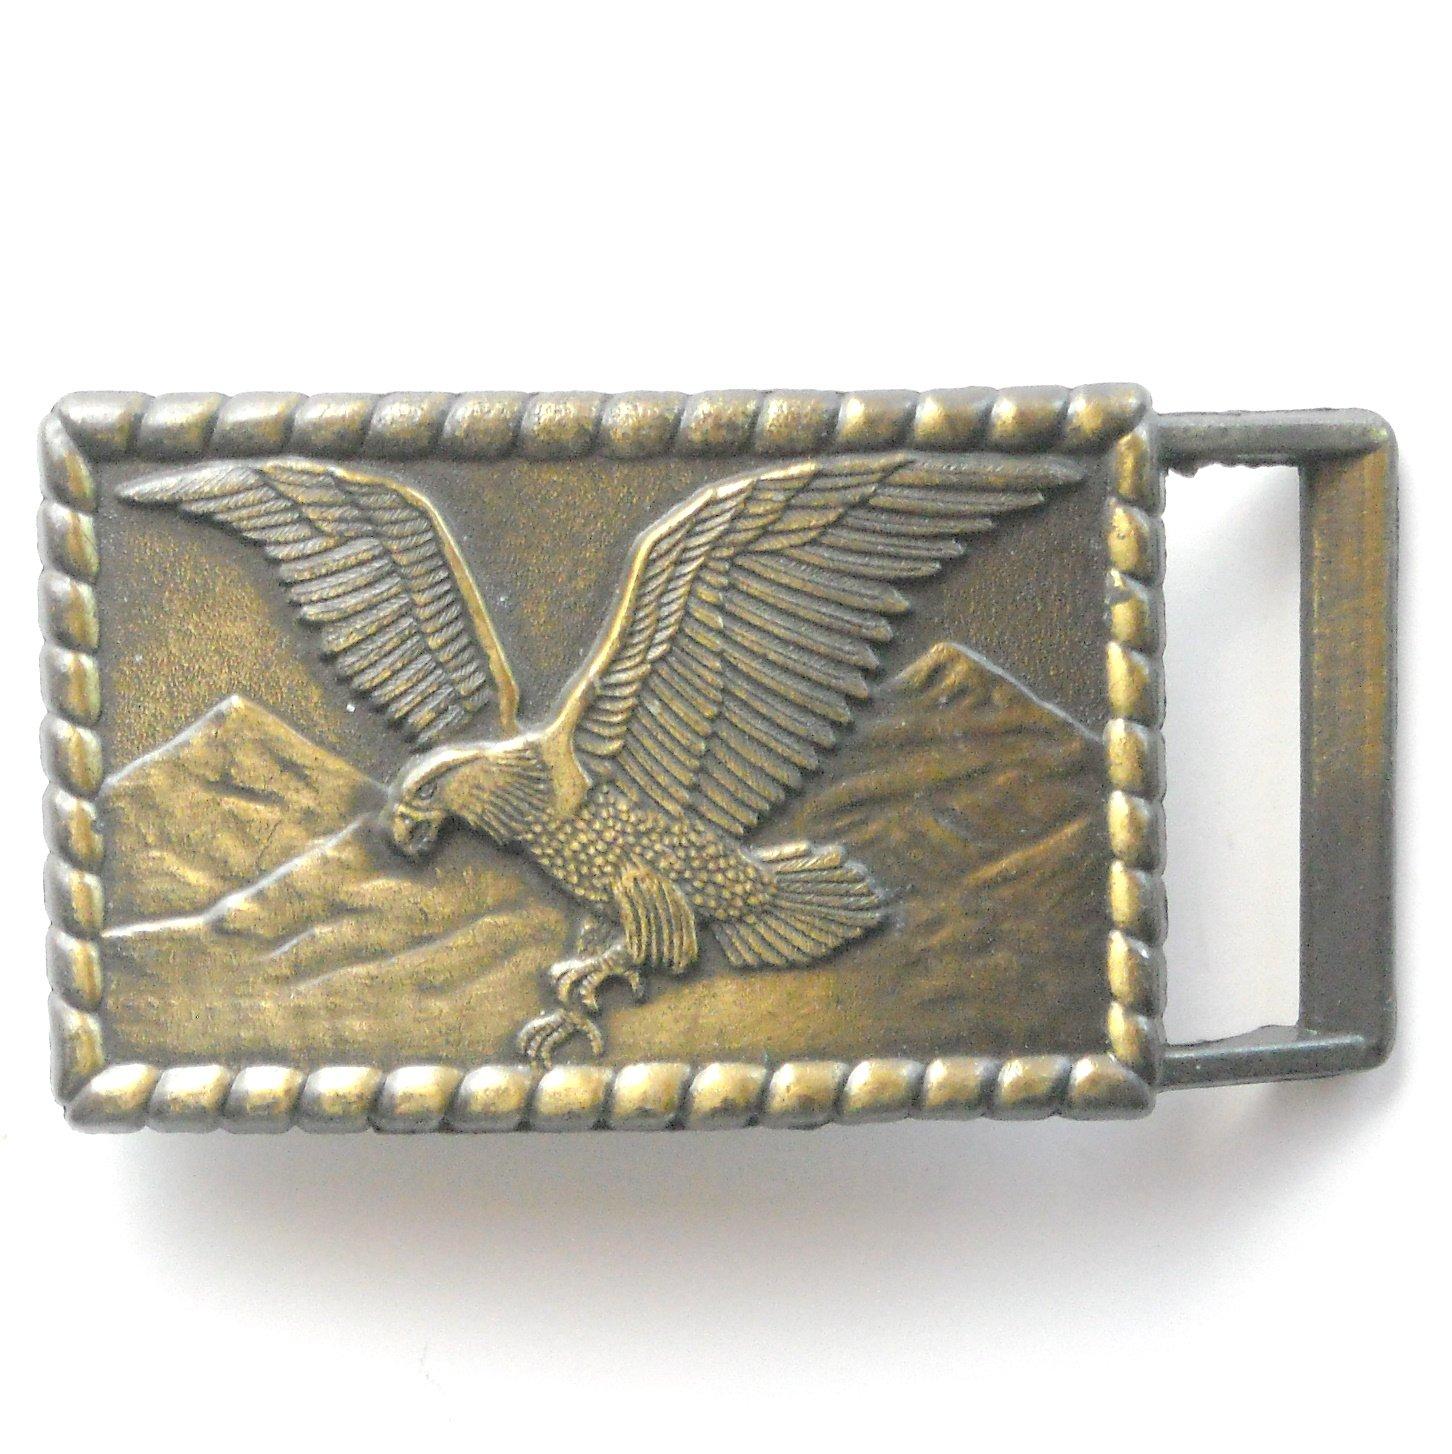 Vintage Western American Bald Eagle Brass Metal Belt Buckle